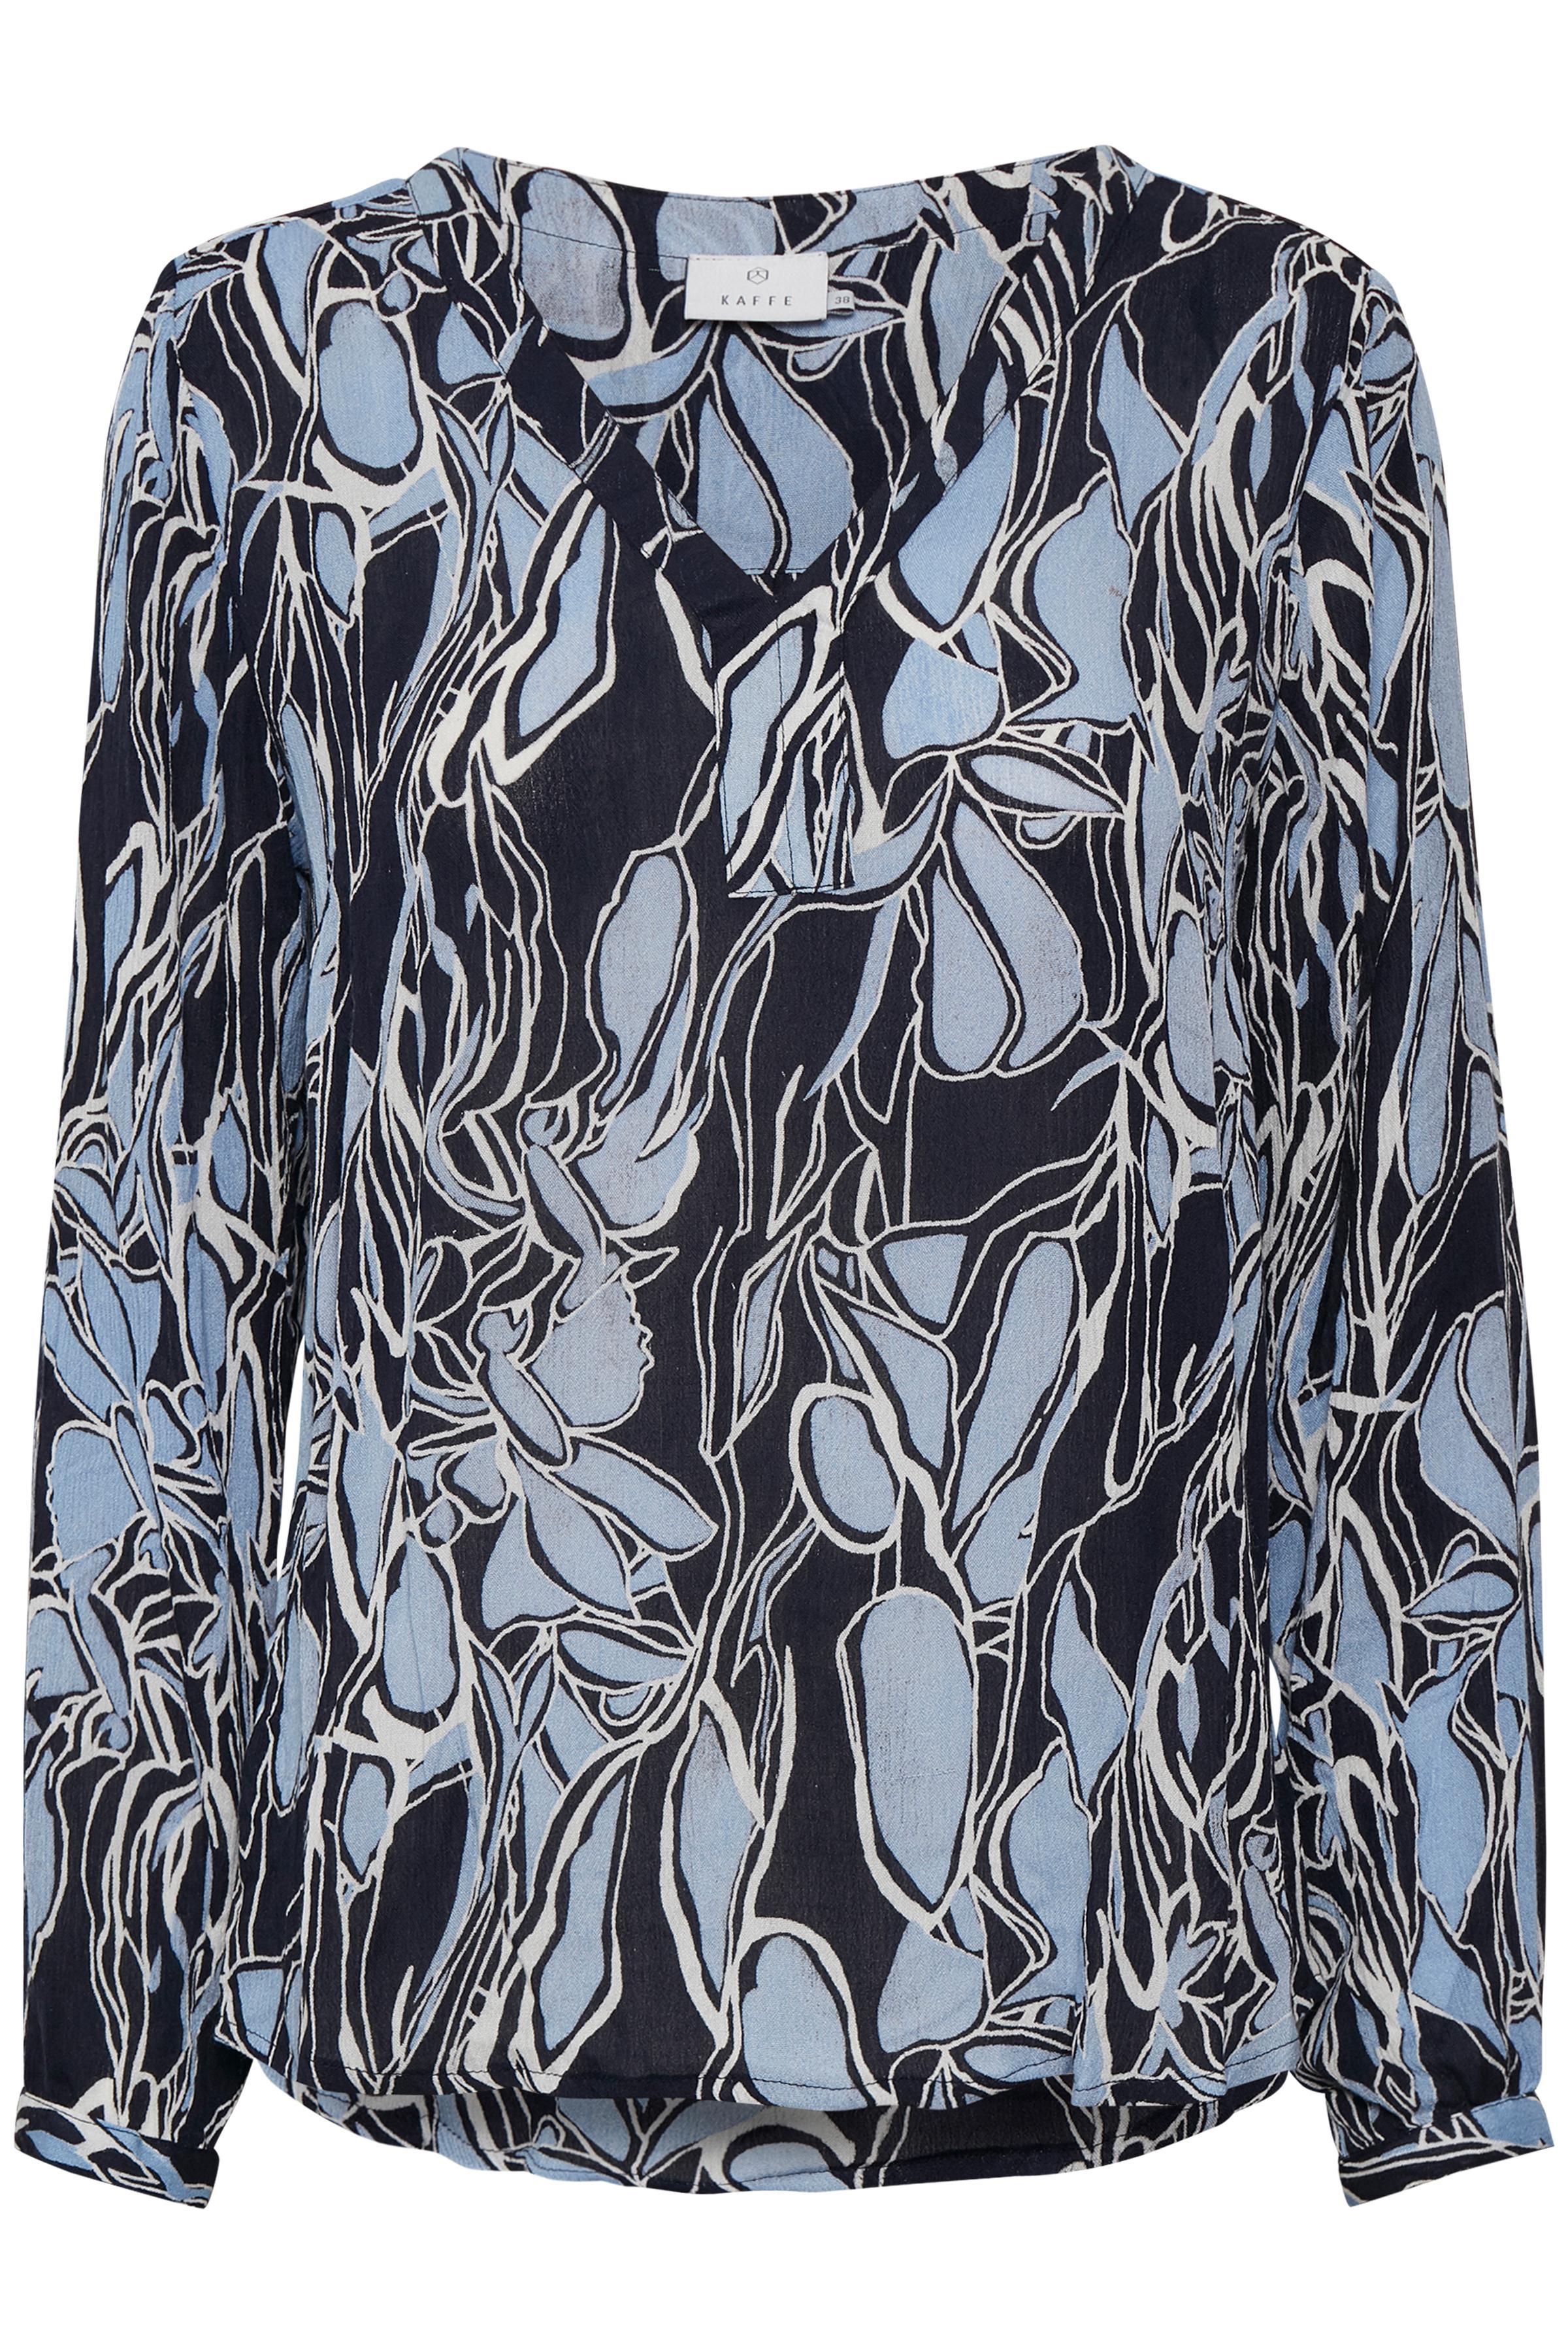 Marineblau/staubblau Langarm-Bluse  von Kaffe – Shoppen SieMarineblau/staubblau Langarm-Bluse  ab Gr. 34-46 hier